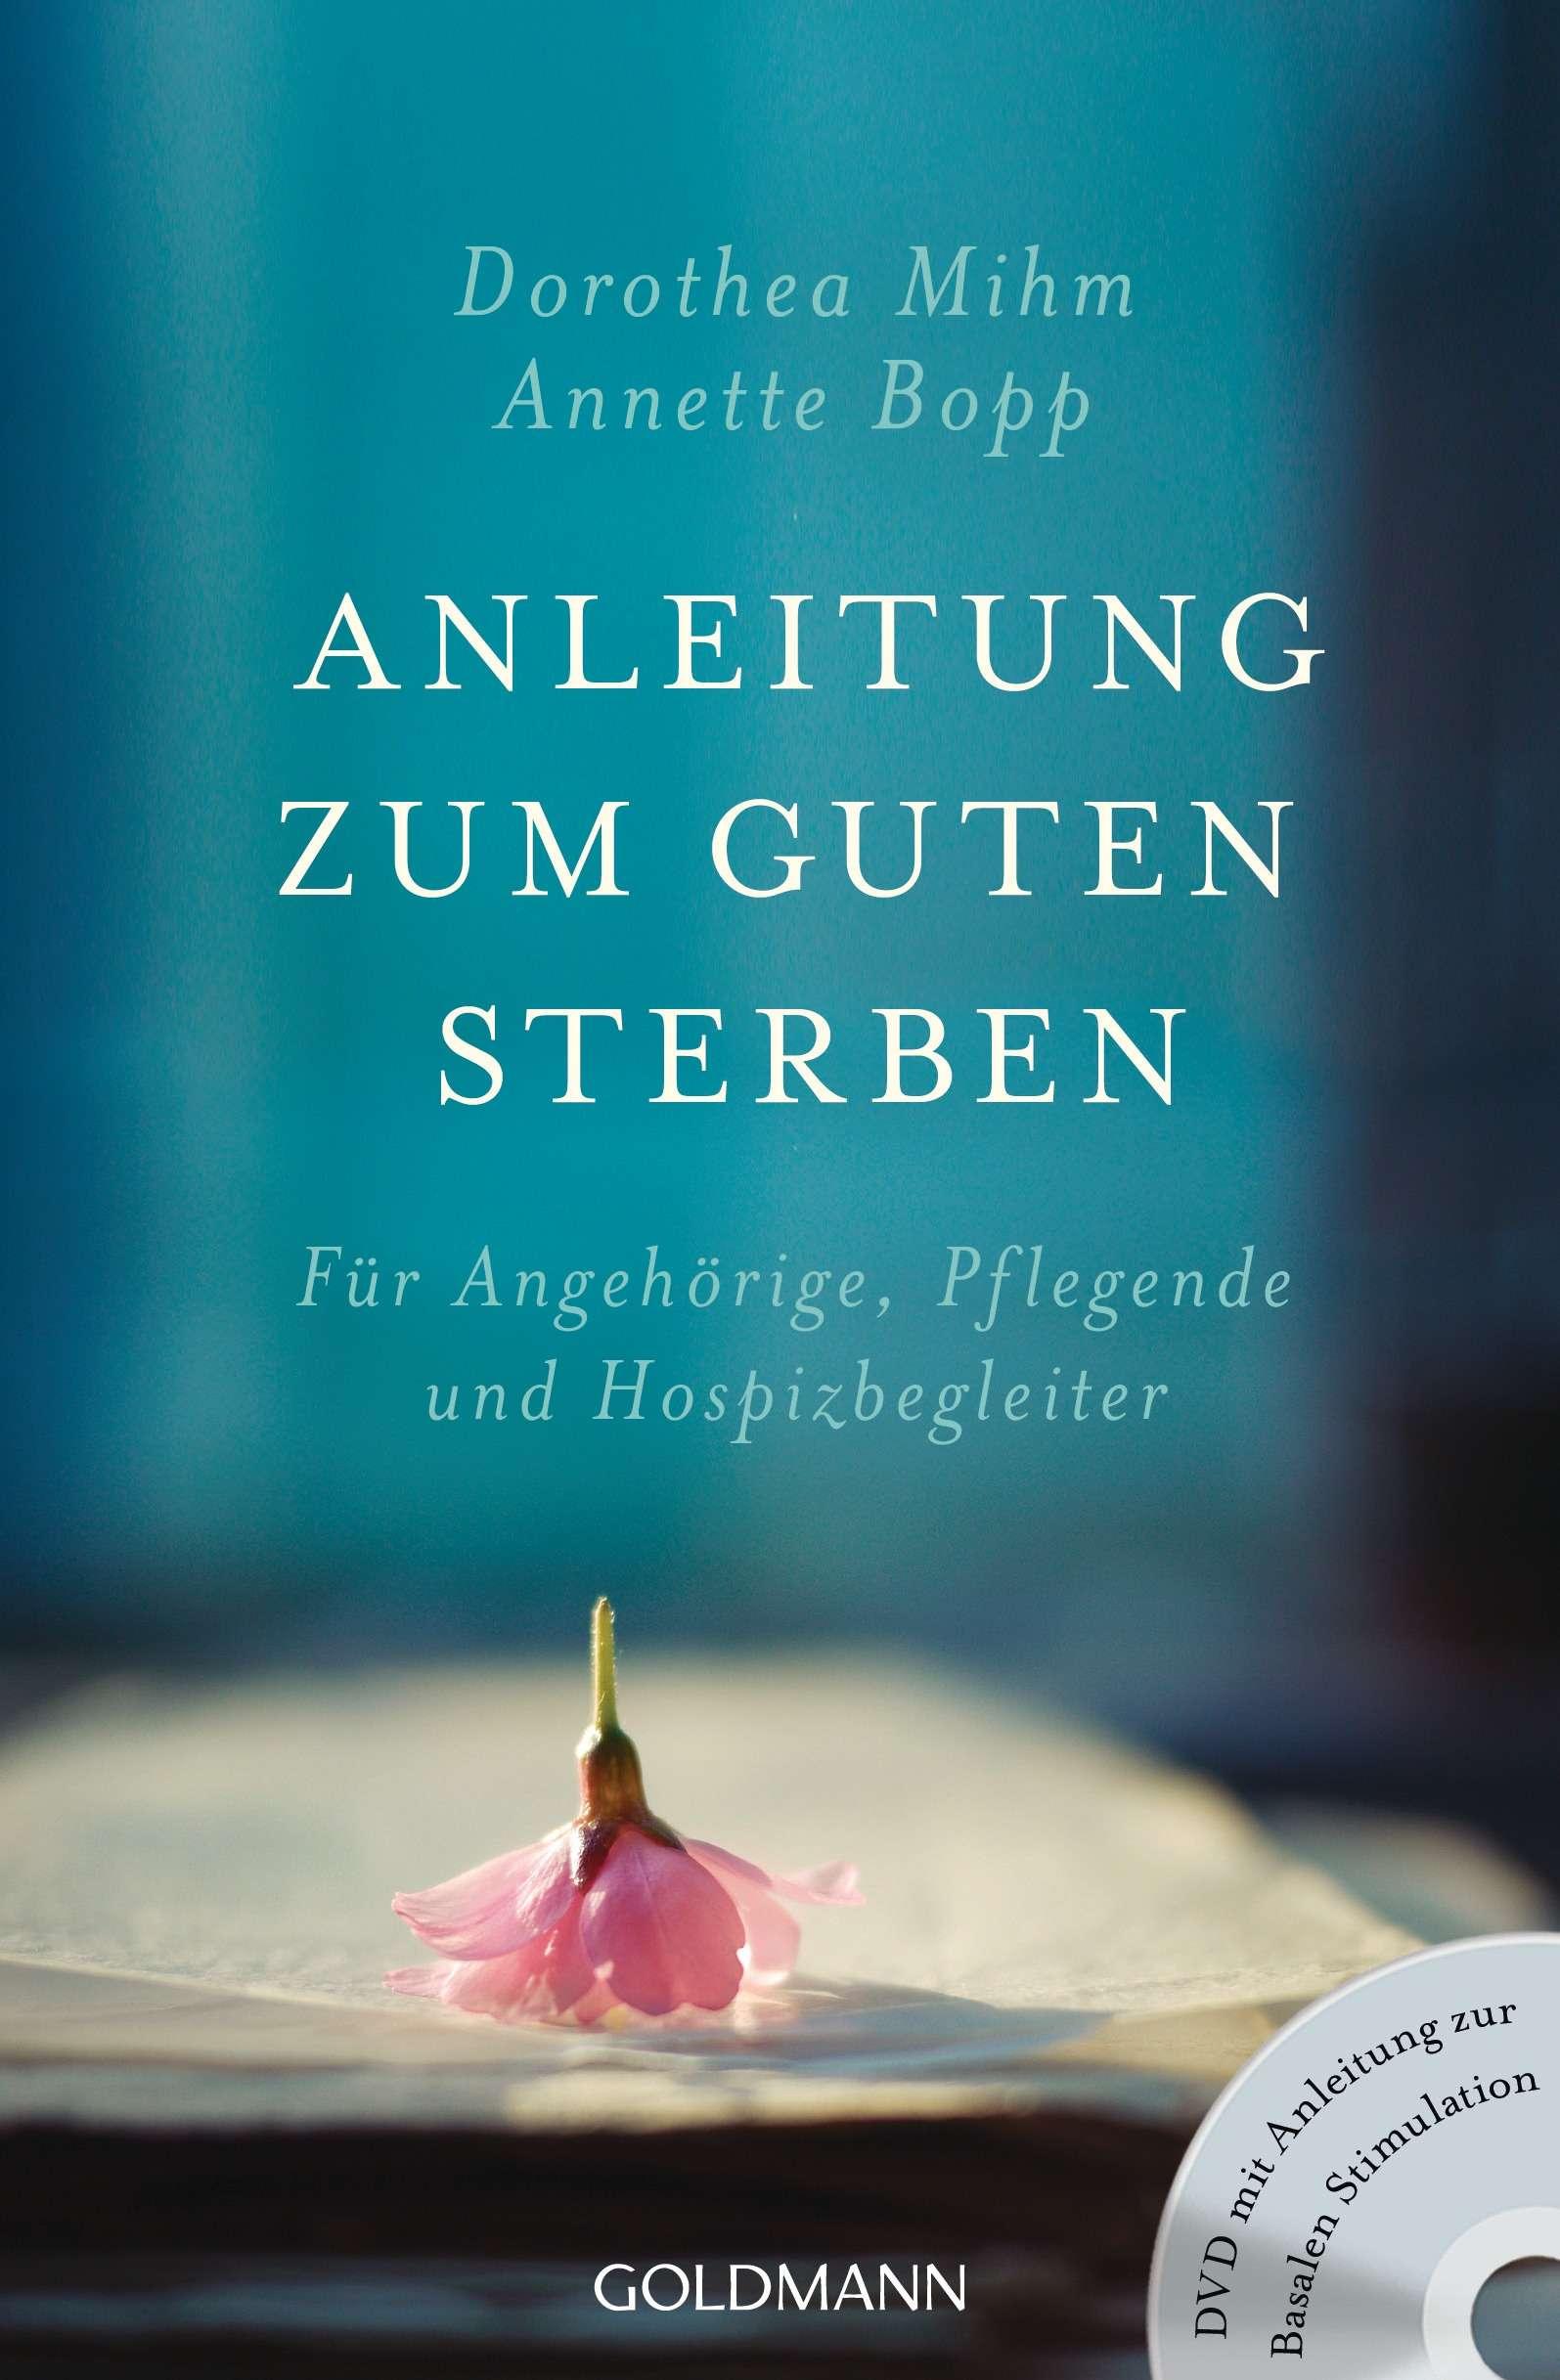 """Anleitung zum guten Sterben"" von Dorothea Mihm & Annette Bopp © Goldmann Yogannetteblog.de"